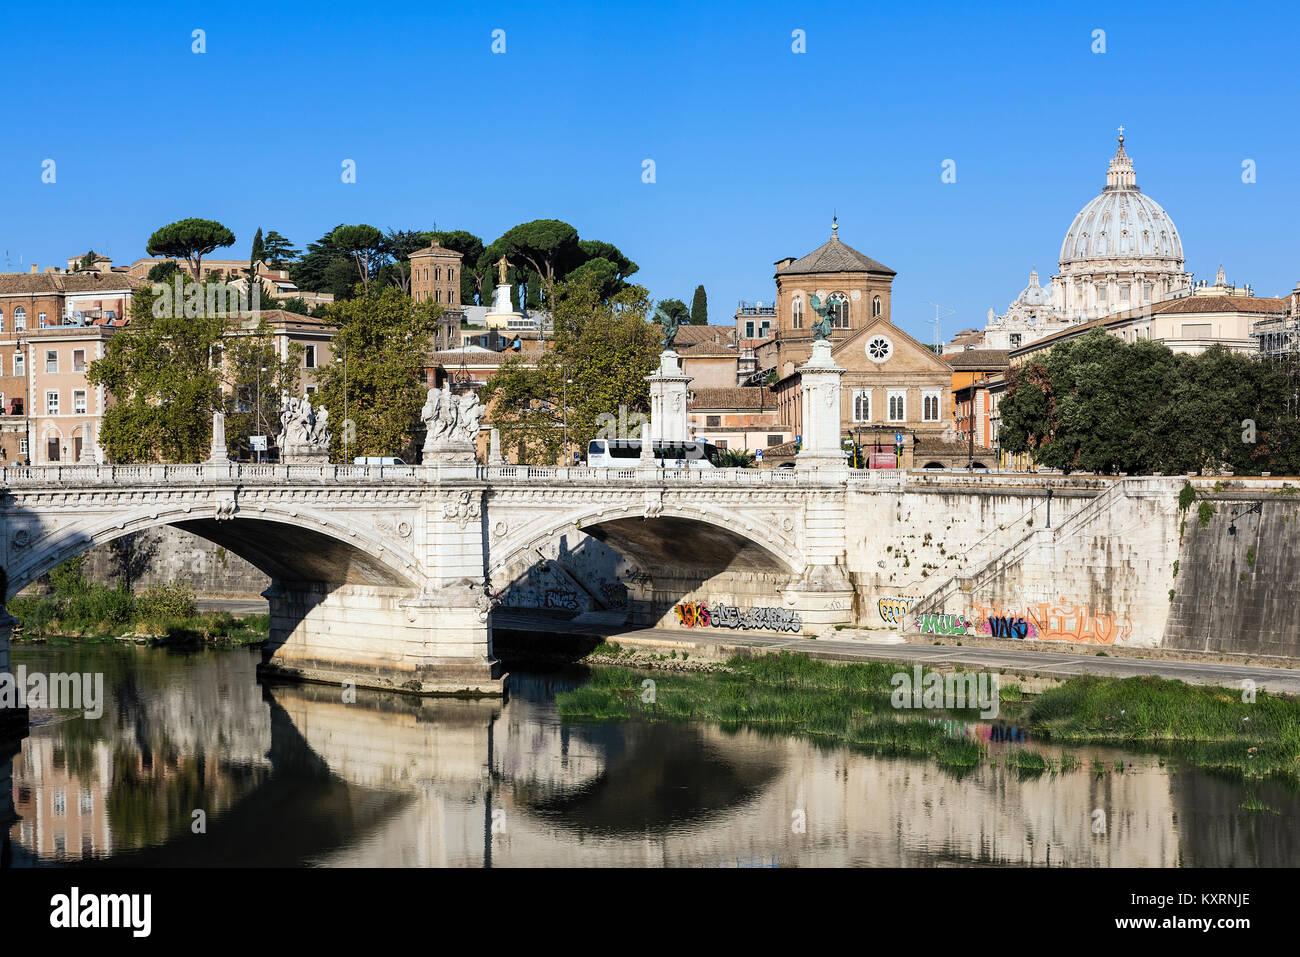 Ponte Vittorio Emanuele II, Rome, Italy. - Stock Image